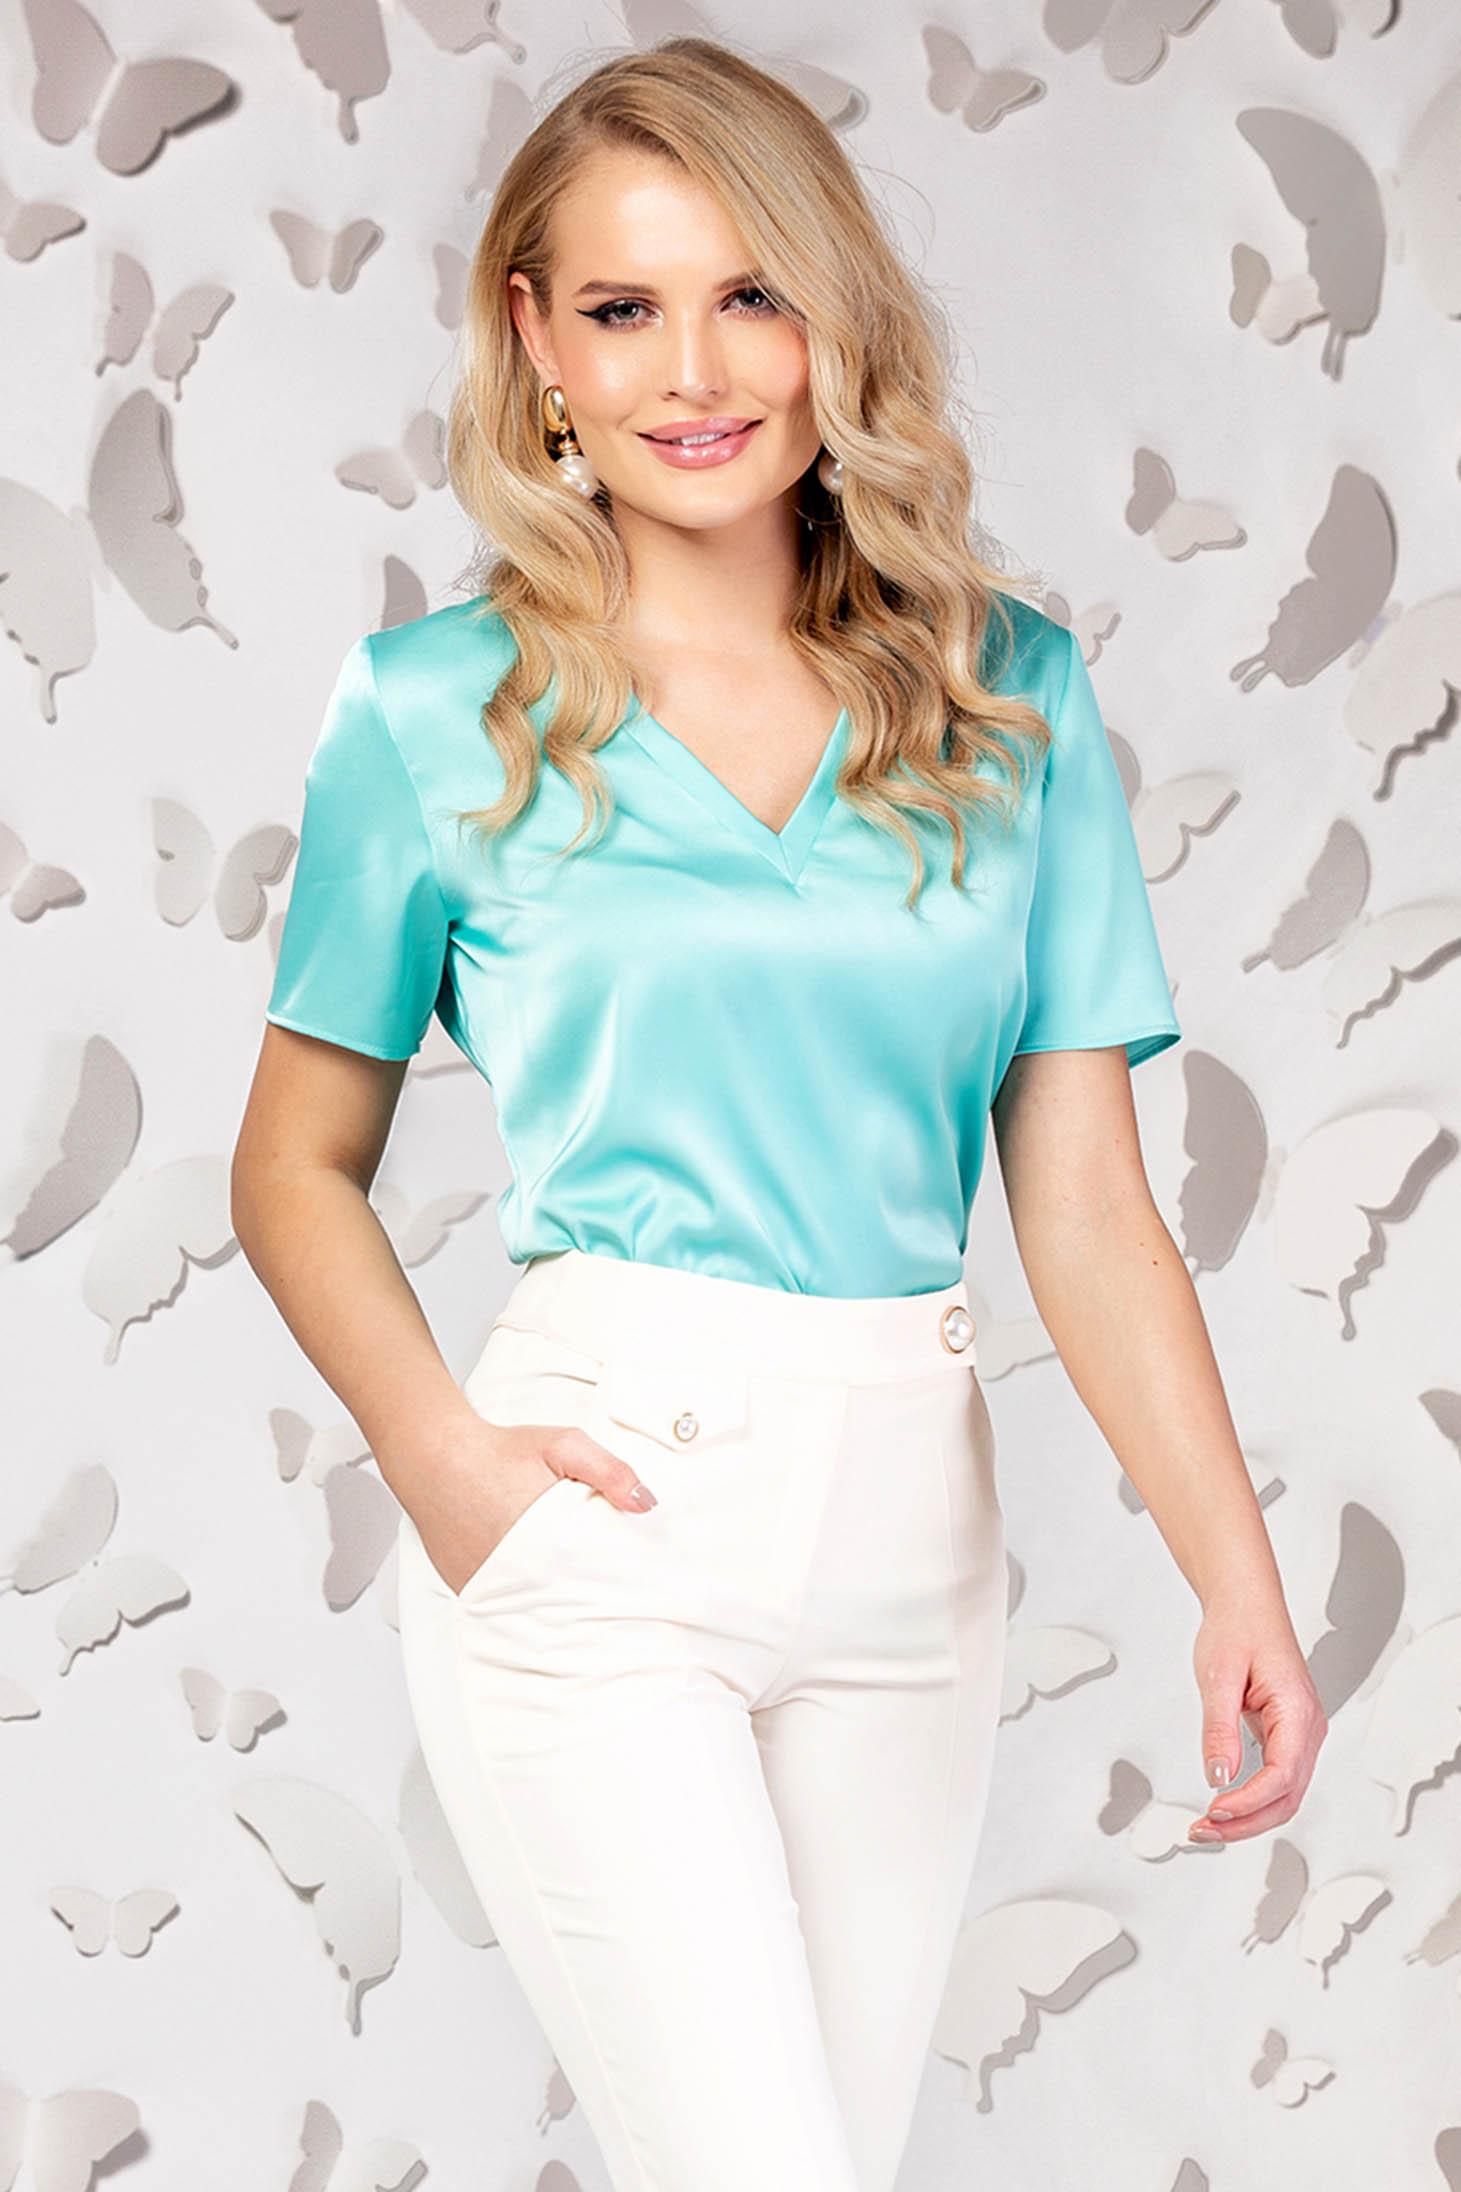 Office short cut flared short sleeve turquoise women`s blouse